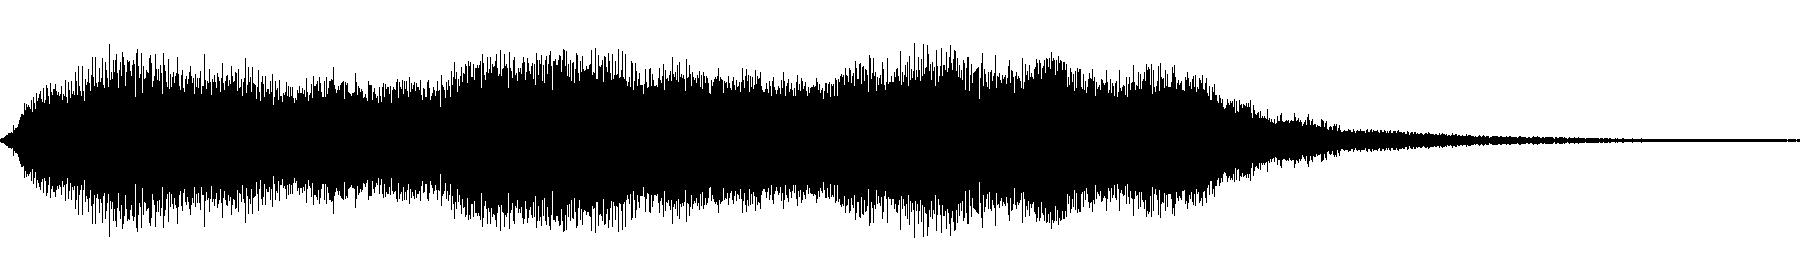 organ csus4